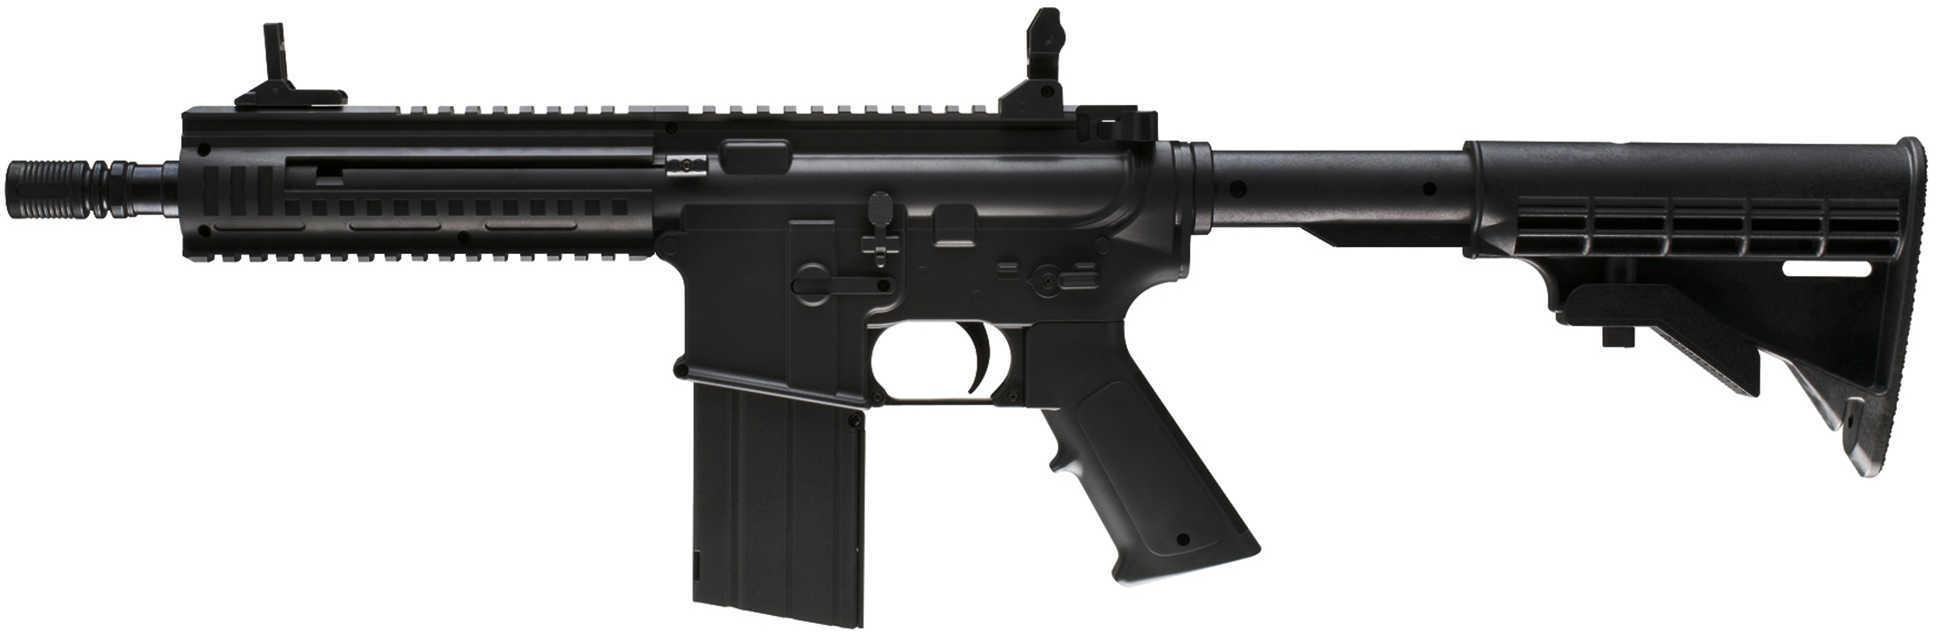 Umarex USA RWS 2254855 Steel Force Air Rifle M4 Style Select Fire .177 BB Black Airgun Md: 2254855